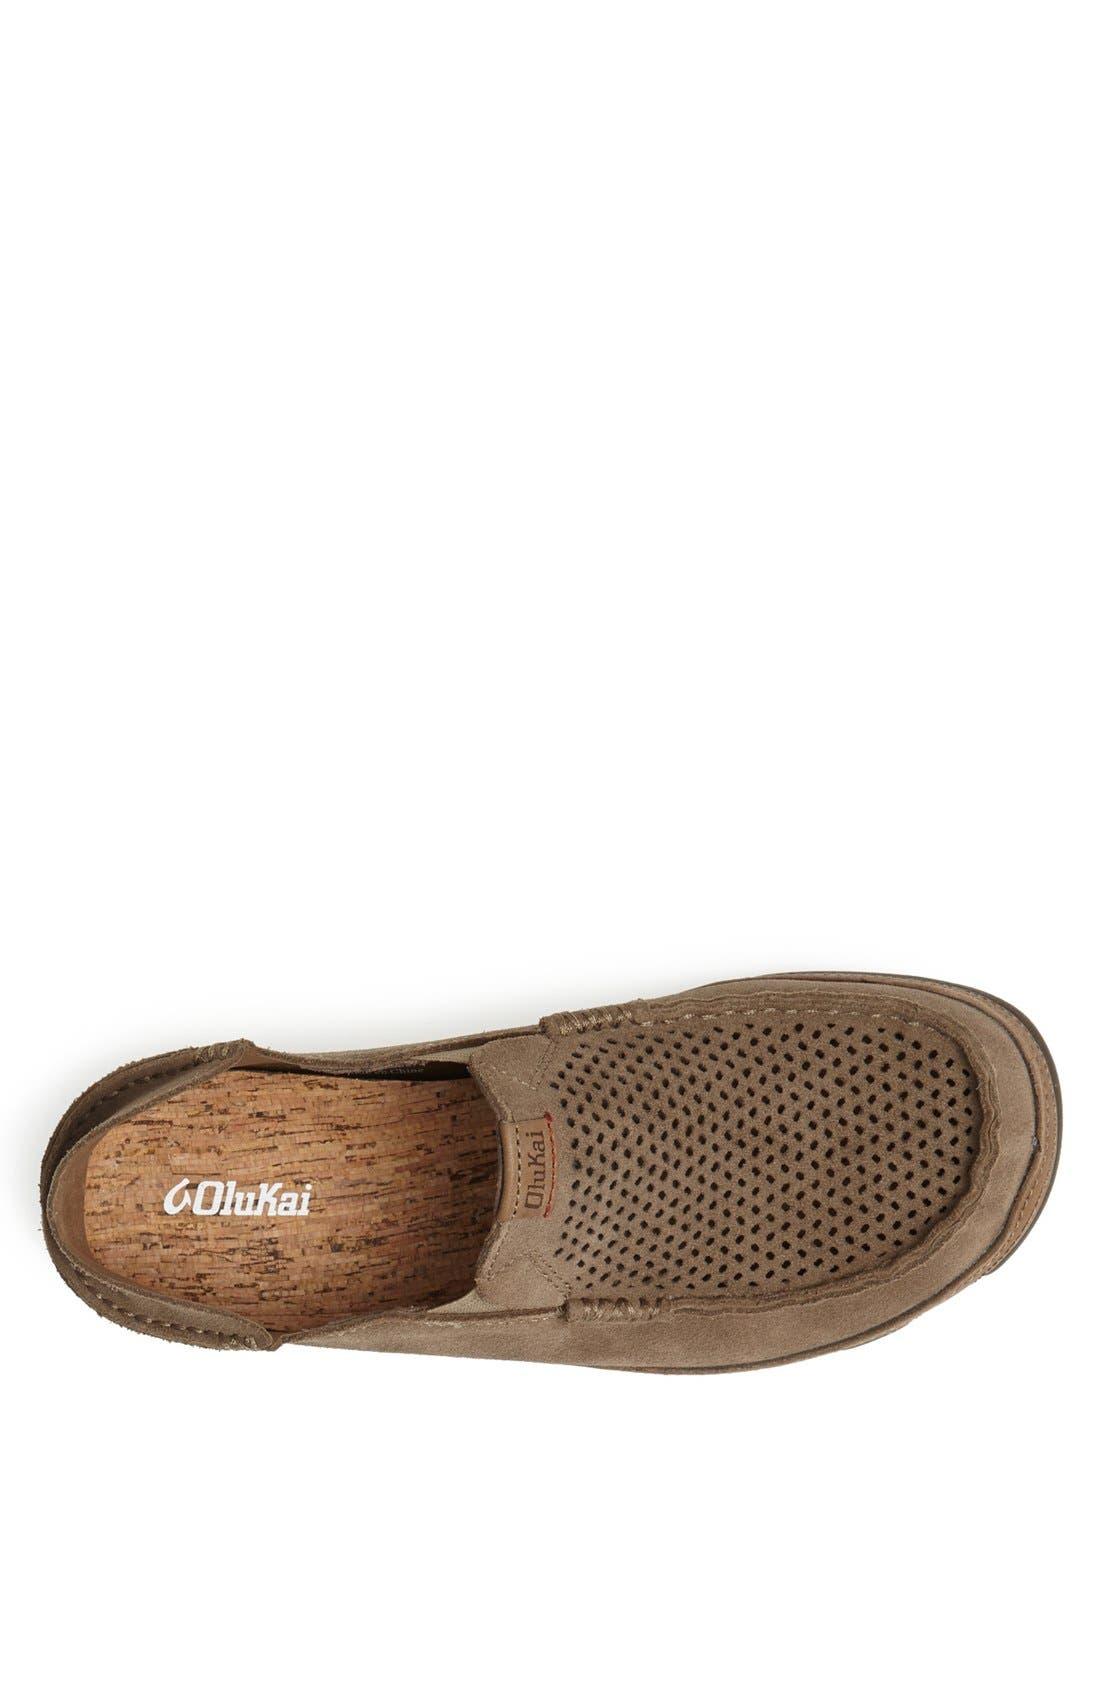 Alternate Image 3  - OluKai 'Moloa Kohana' Slip-On